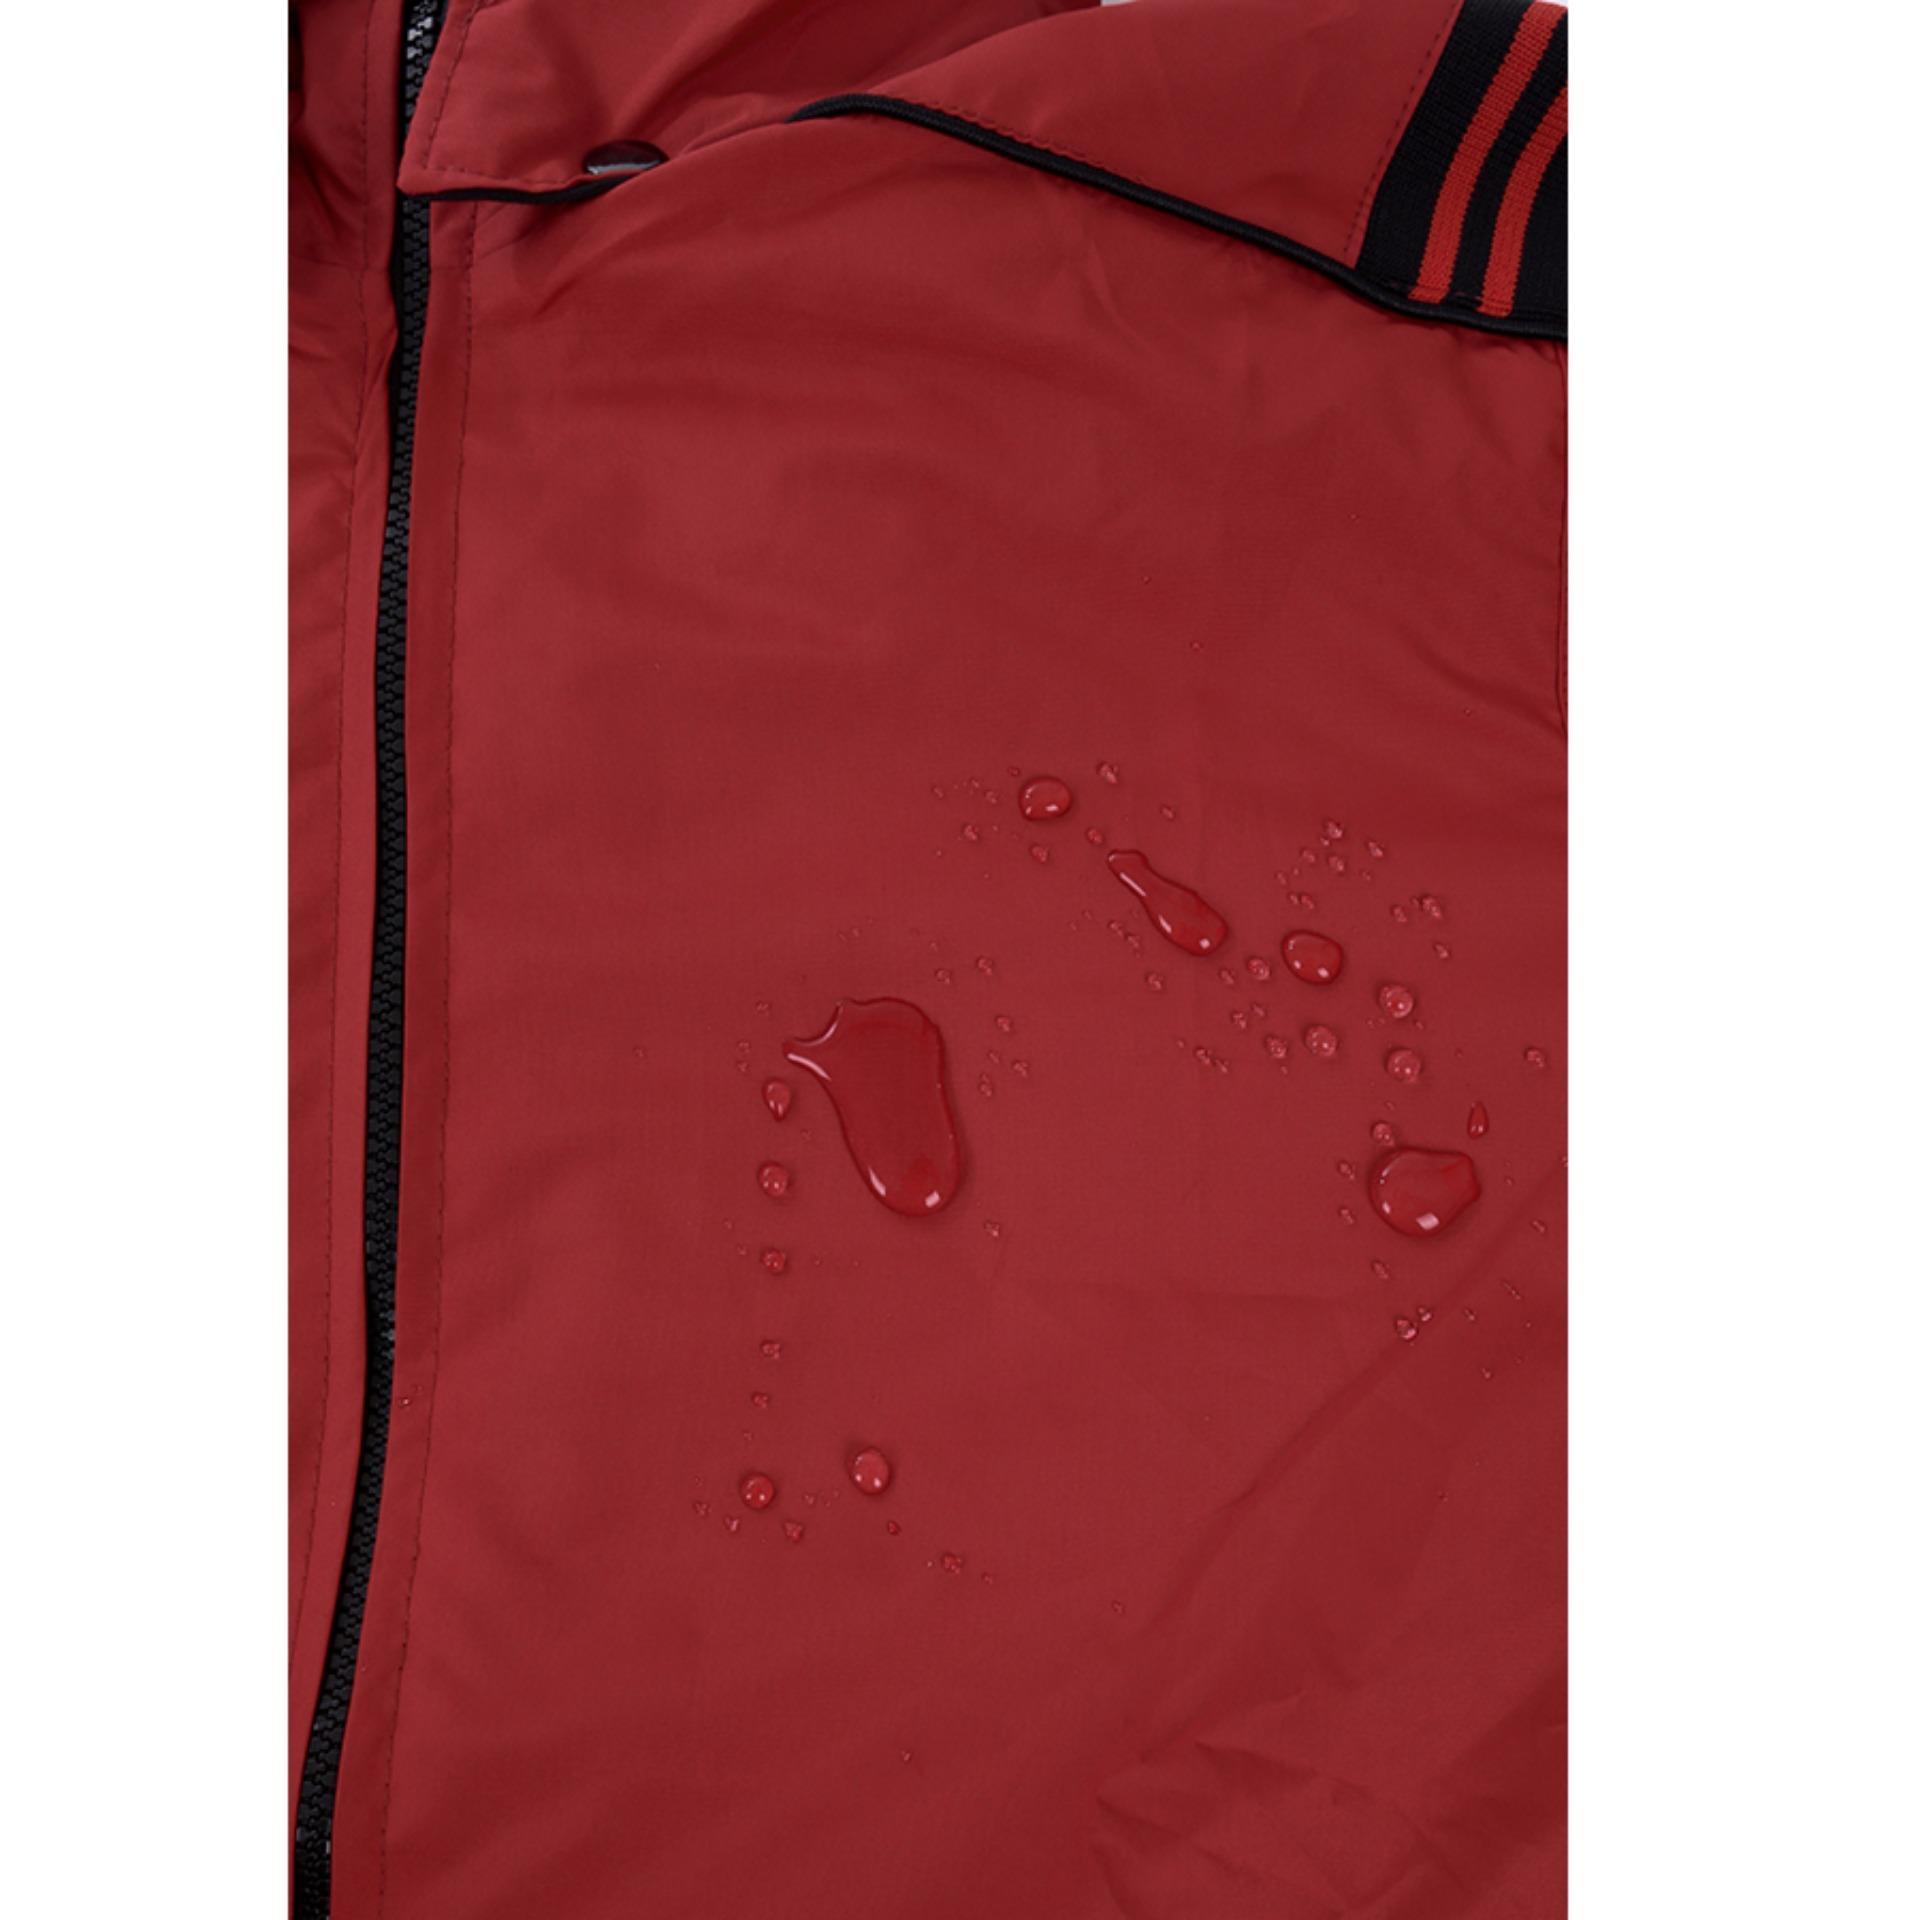 Harga Saya Elfs Shop Jaket Hoodie Waterproof Bolak Balik 2 Sisi Galant Dua Warna 175d15 Mens Reverseable Outwear